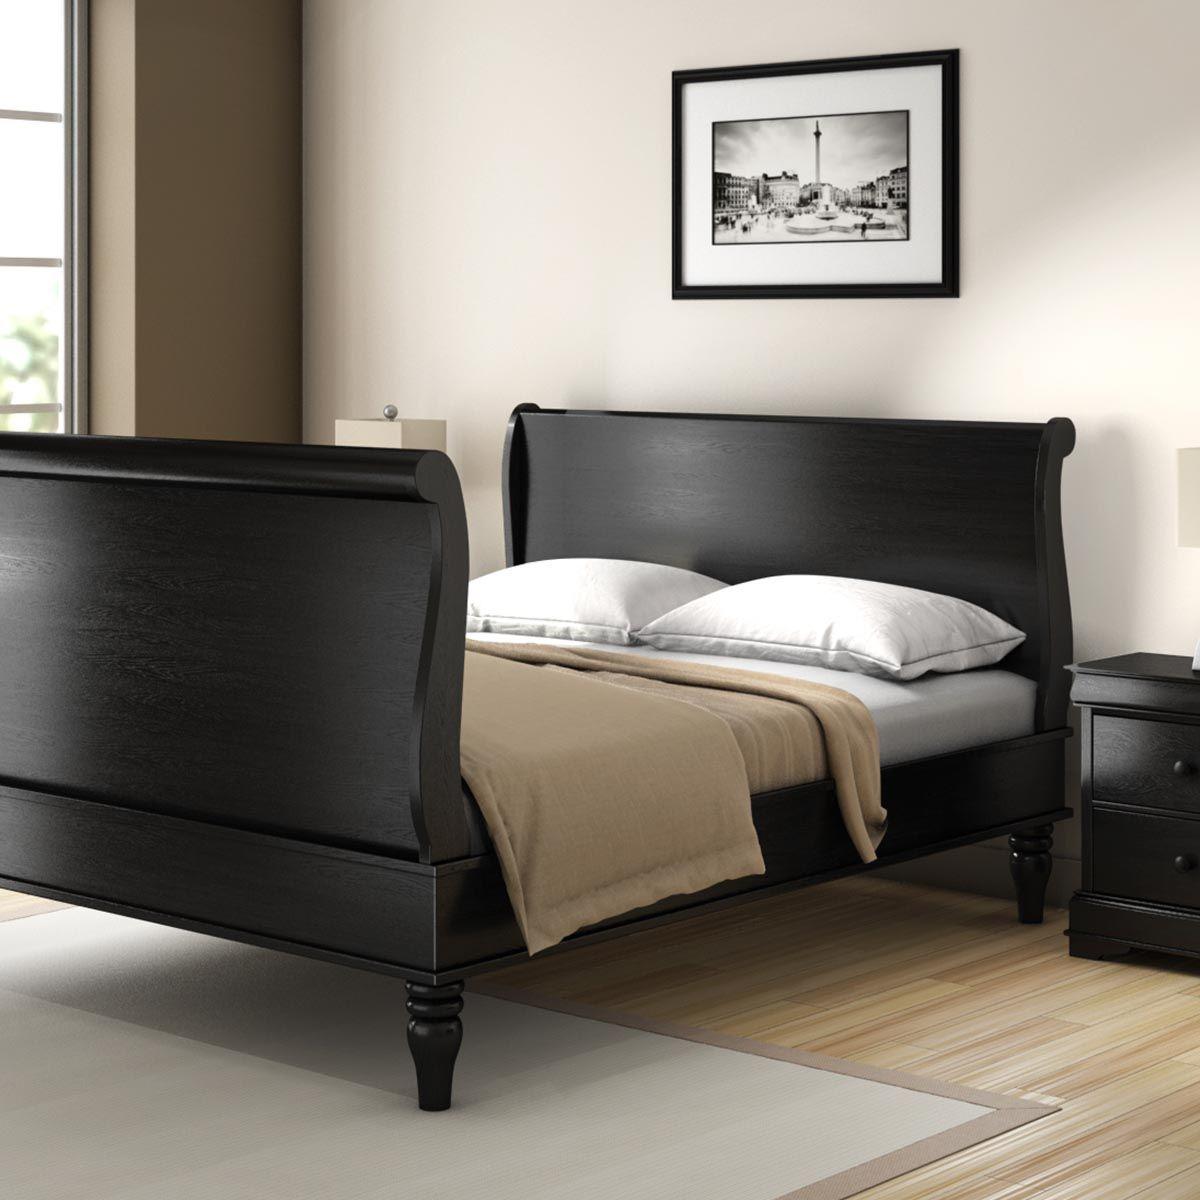 Sierra Living Concepts Checkered Solid Wood California King Size Captains Platform Bed Shop Home Decor Art Home Bed Frame With Storage Wood Bed Design Bedroom Design On A Budget